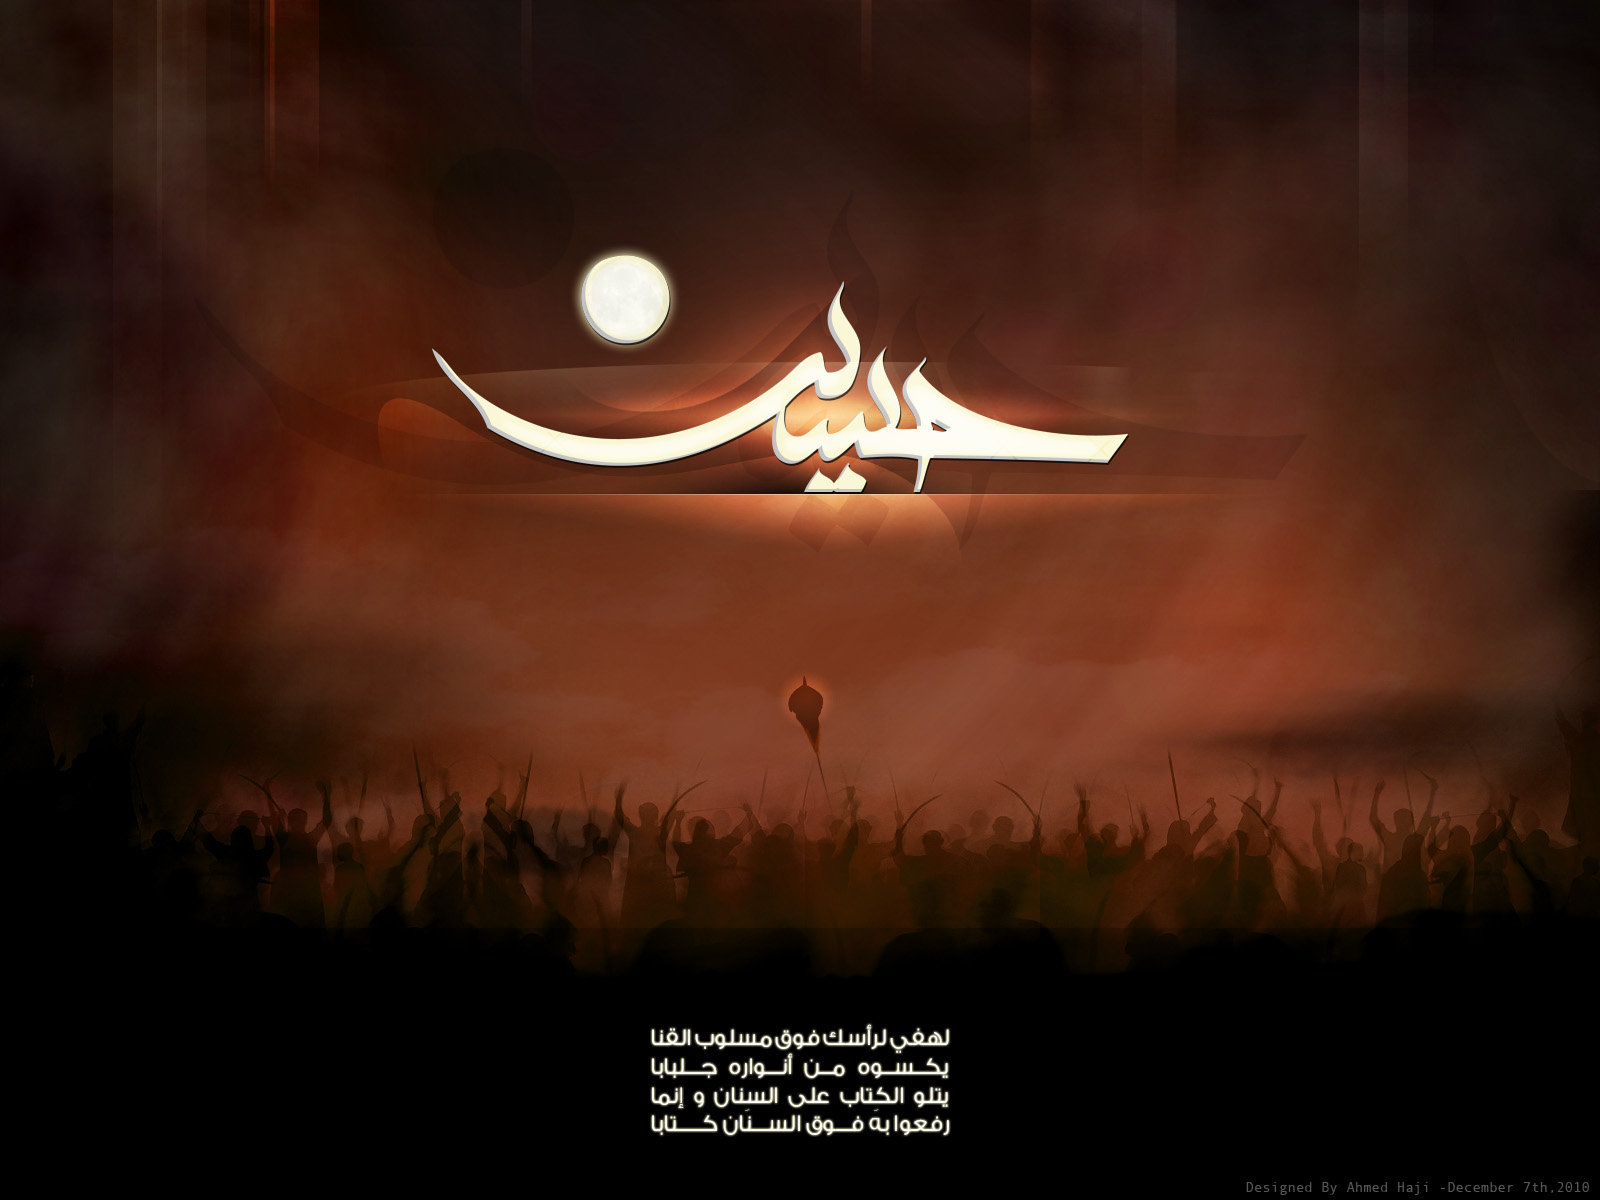 Hd wallpaper ya hussain - Ya Hussain By Alsarea3 Ya Hussain Hd Wallpapers